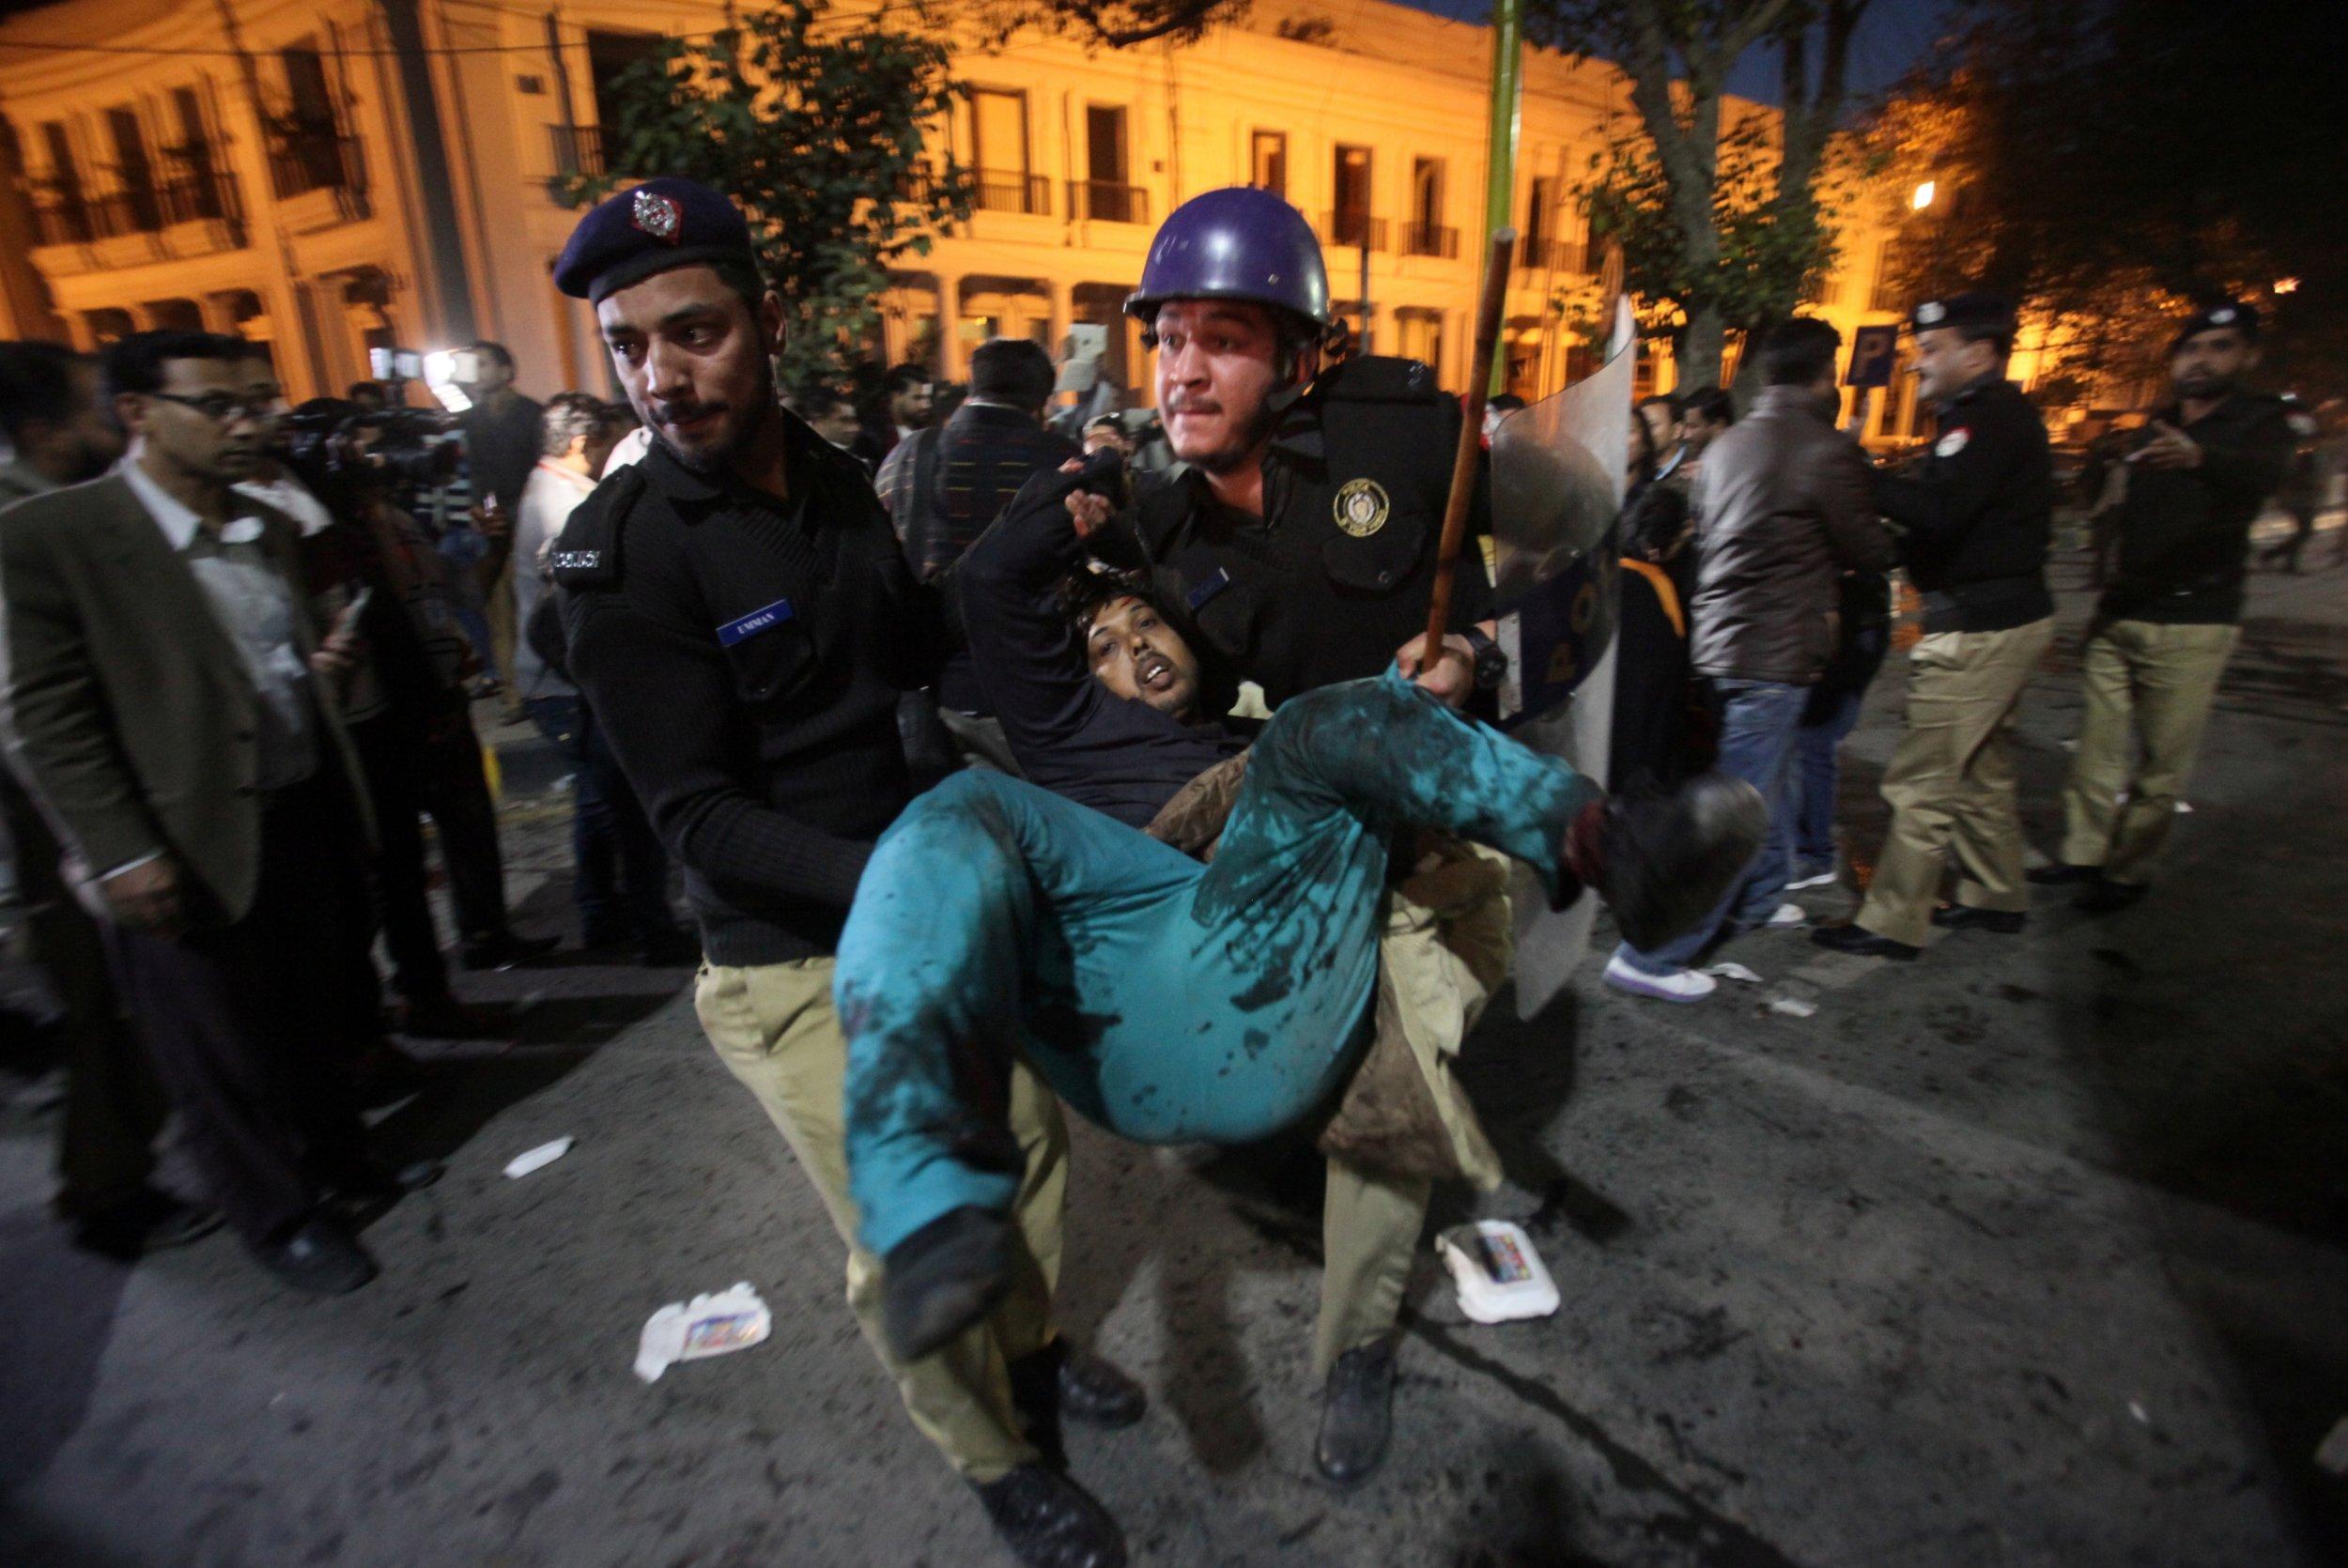 Woman injured in blast